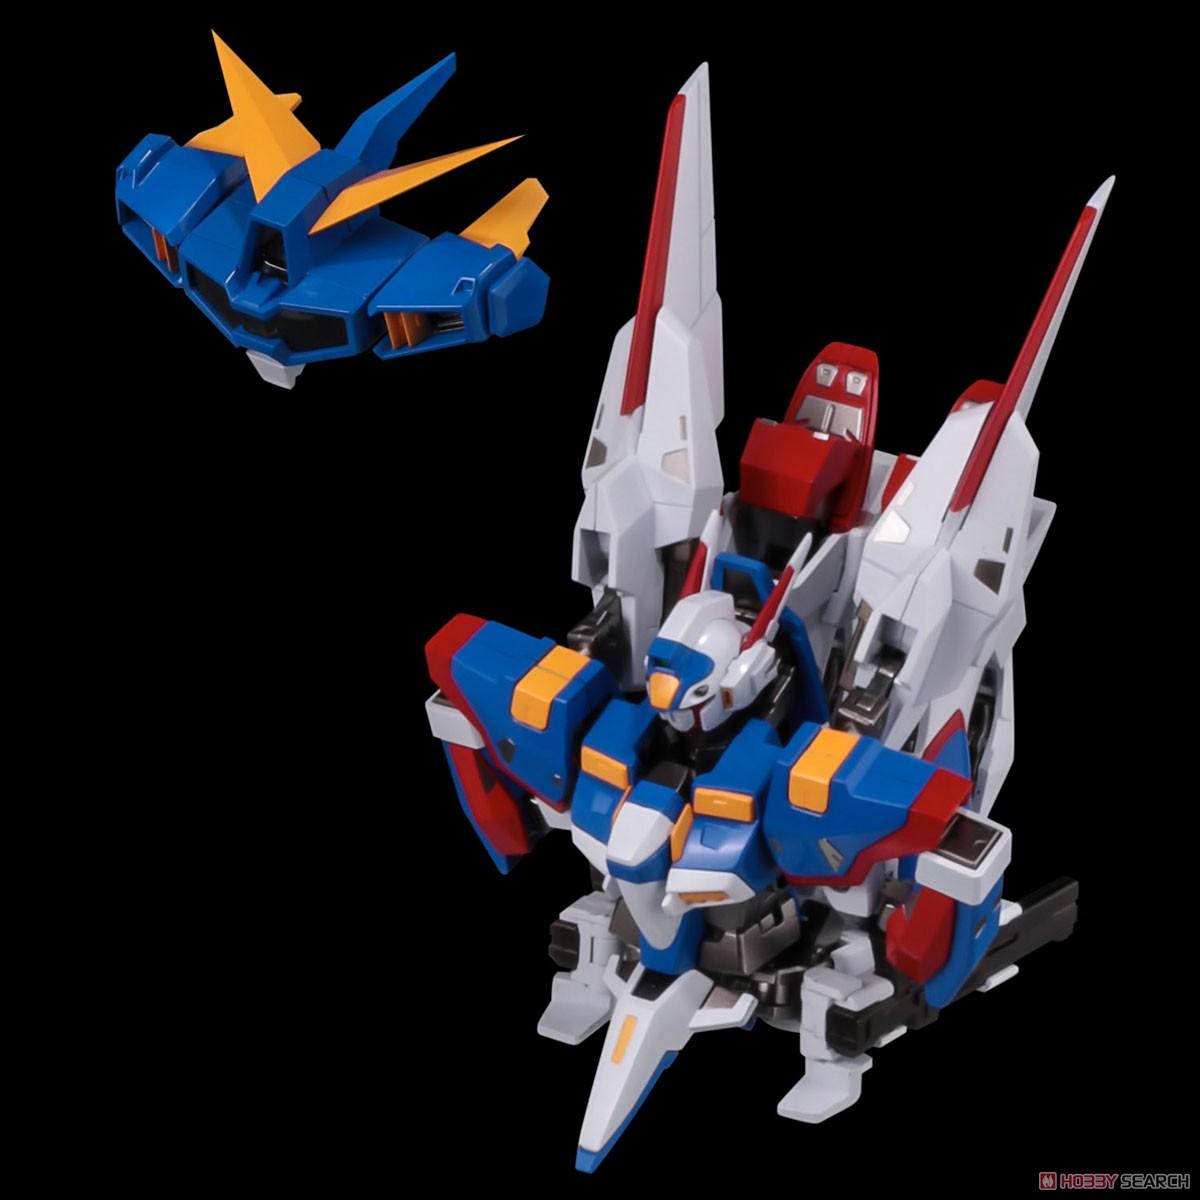 RIOBOT『変形合体 R-1』スーパーロボット大戦OG 可変合体フィギュア-014